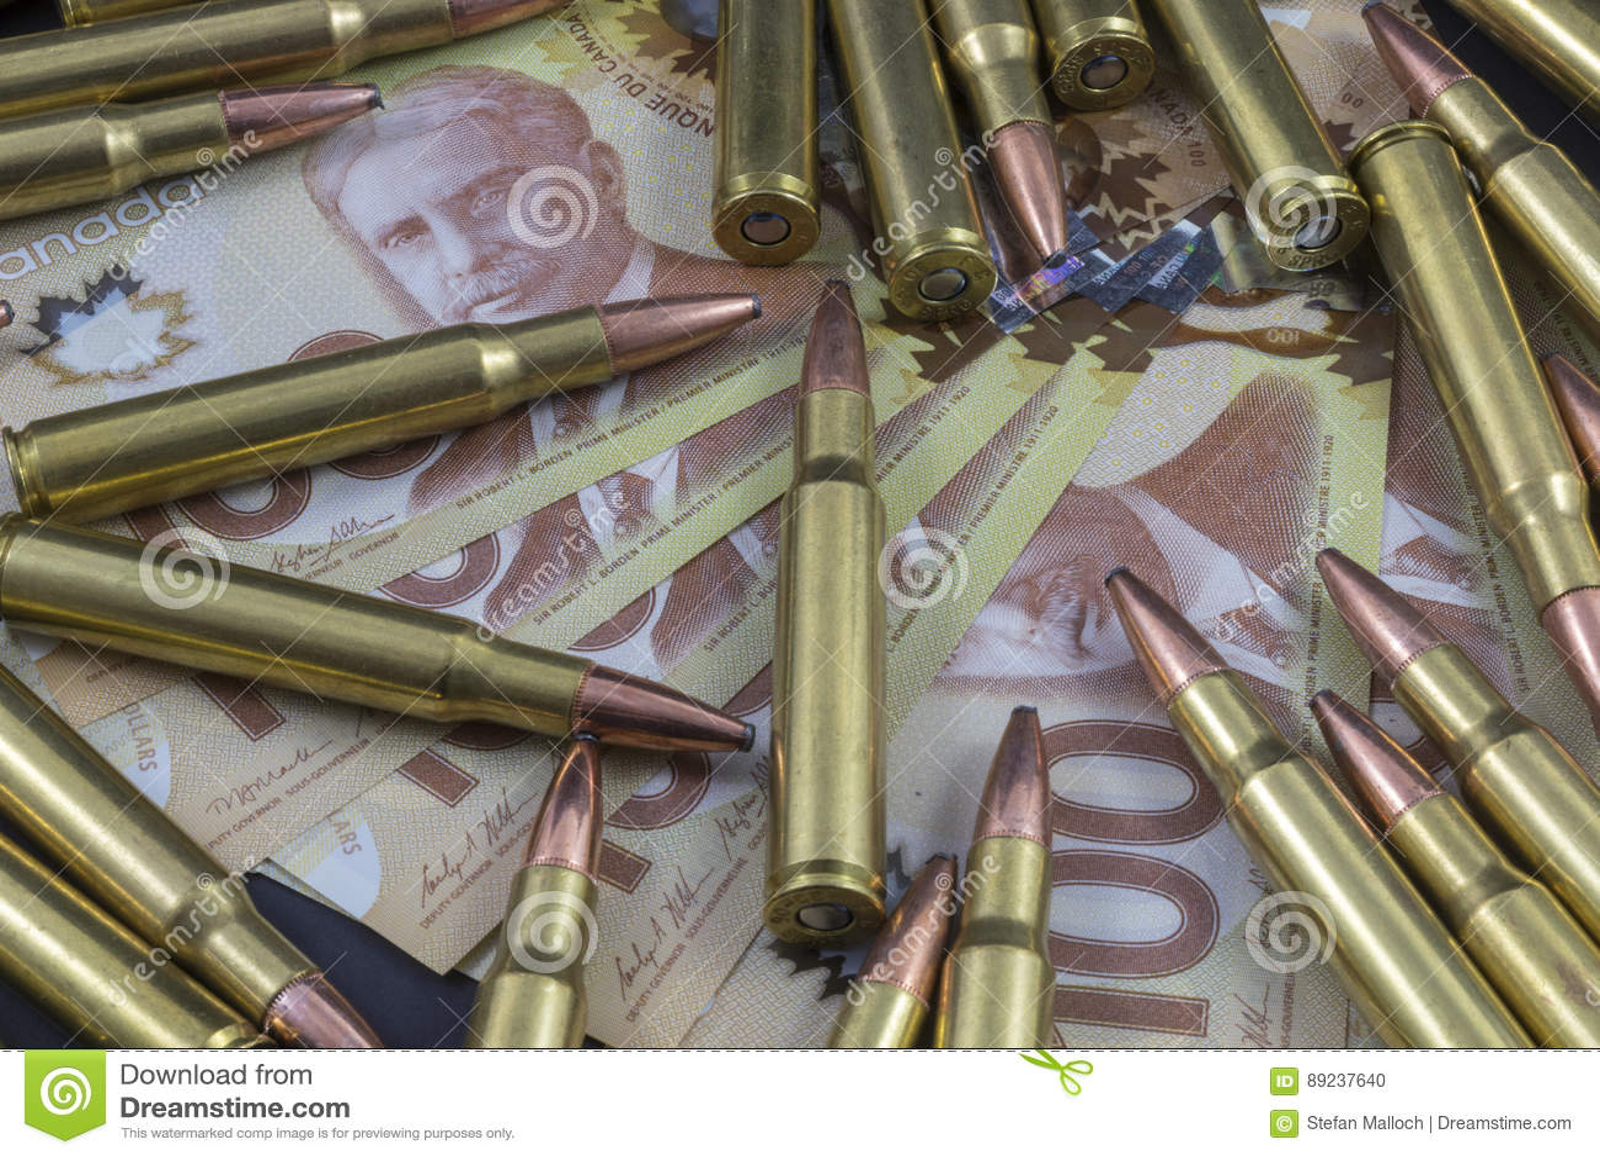 Pile of ammo on Canadian Money